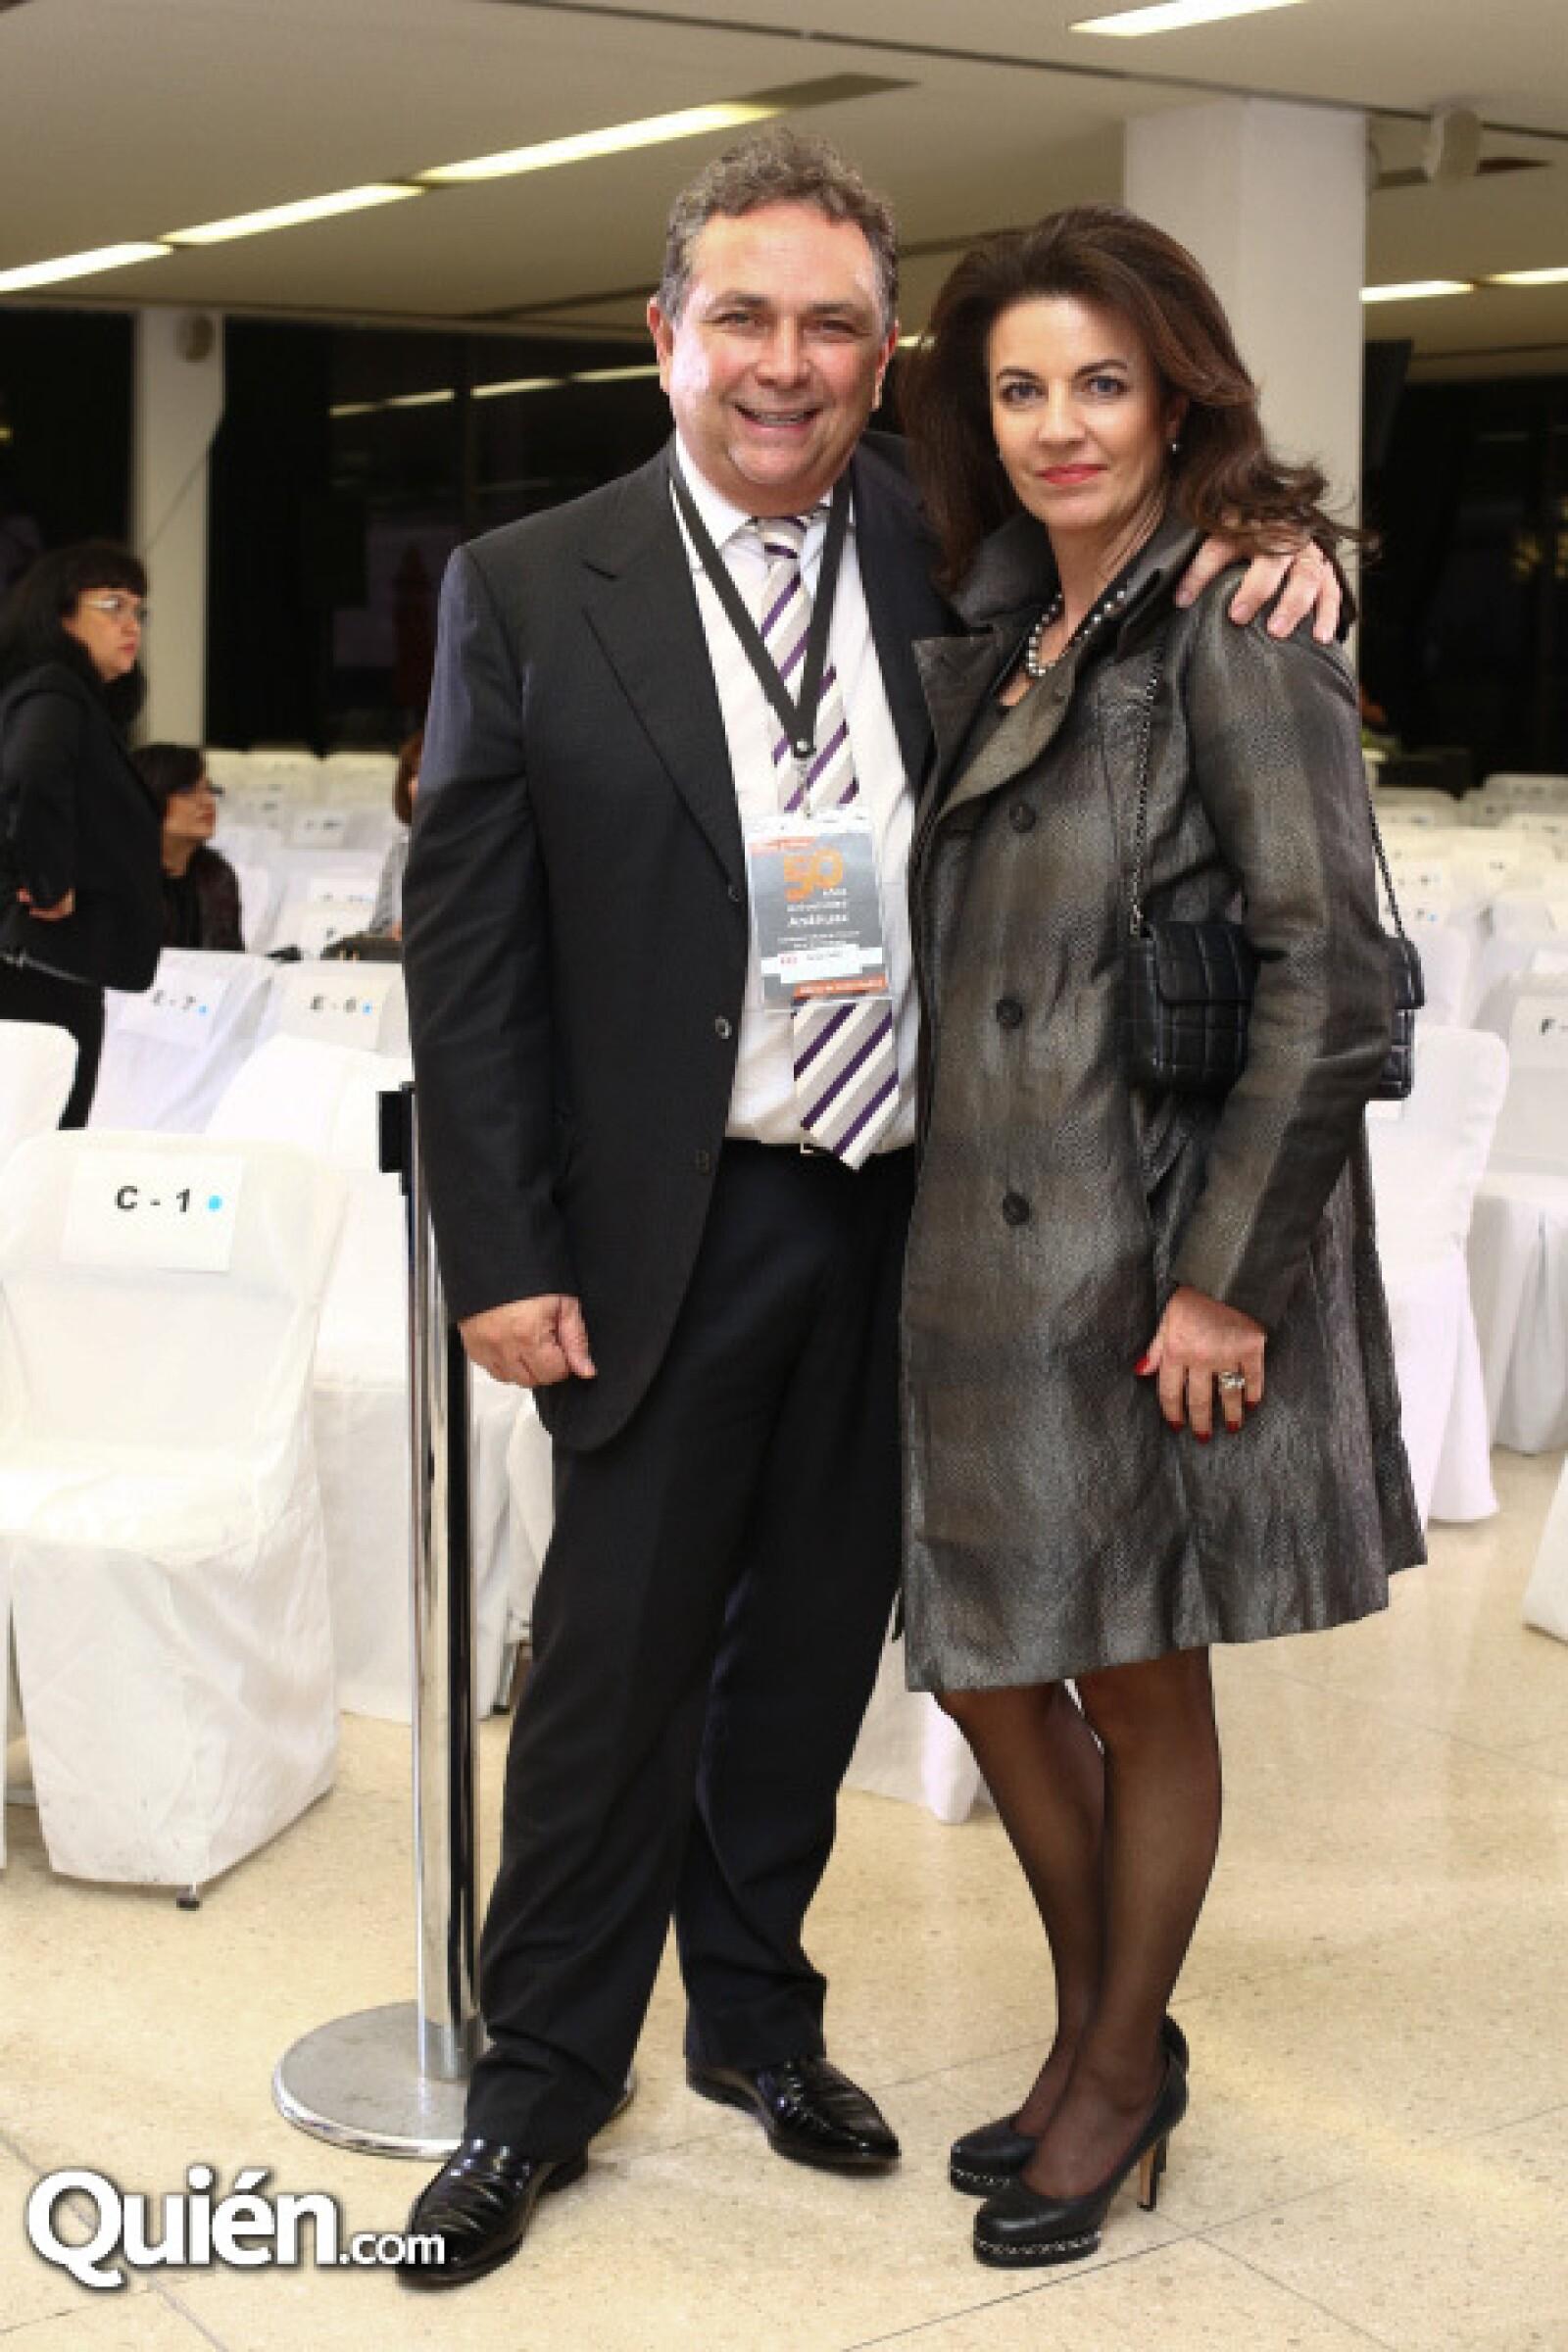 Carlos Cabal Peniche y Teresa Caba.l